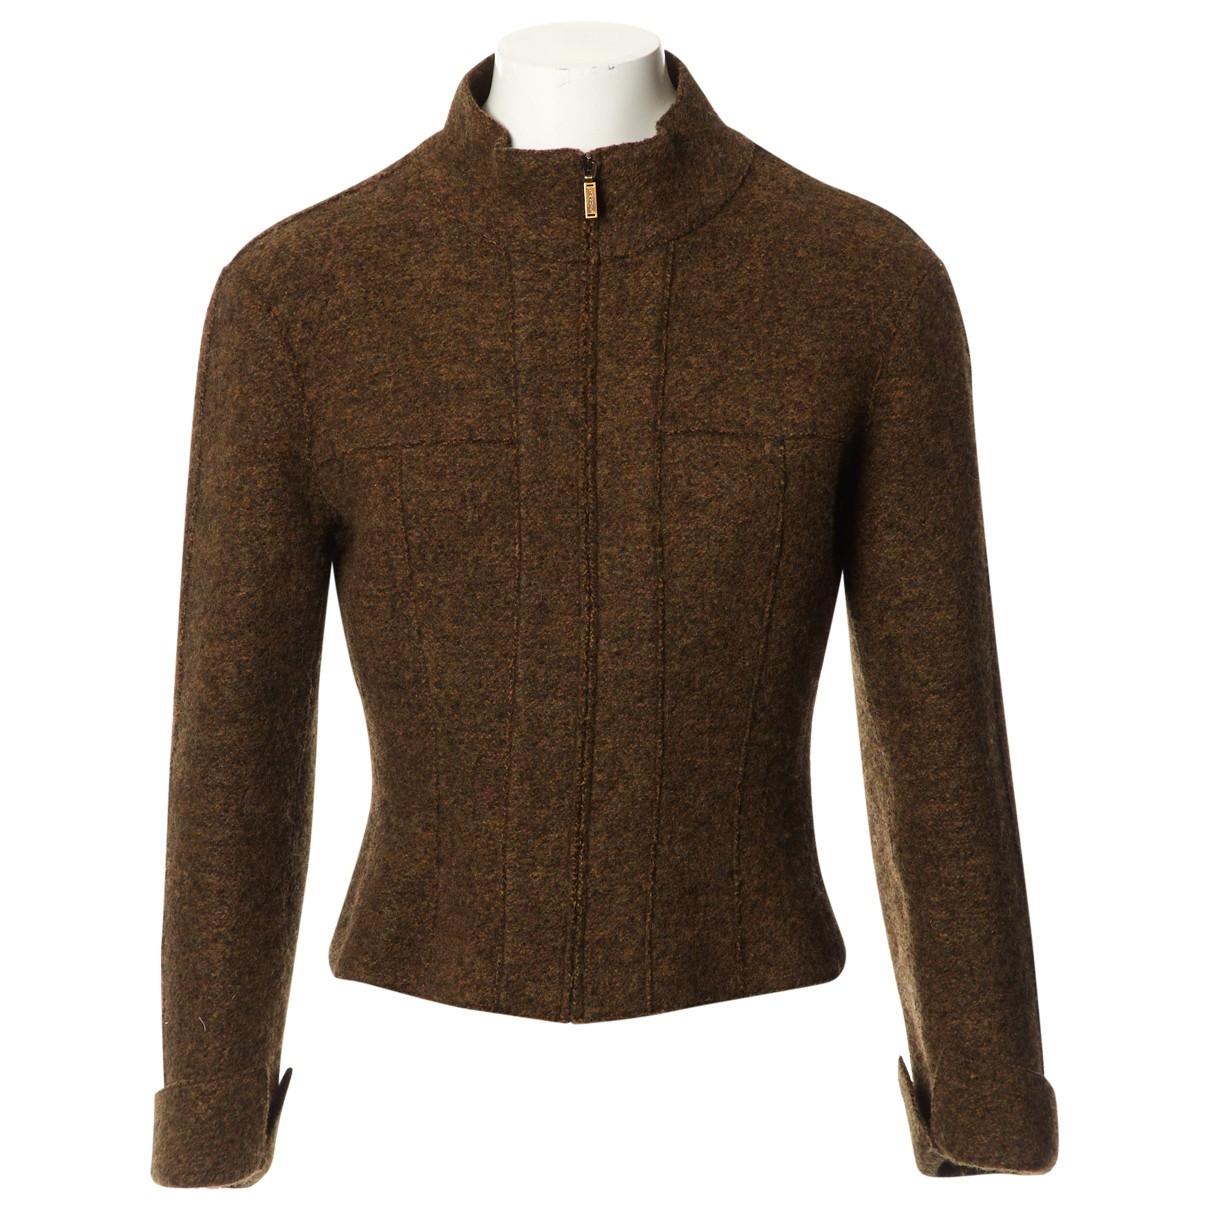 Chanel \N Brown Wool jacket for Women 38 FR